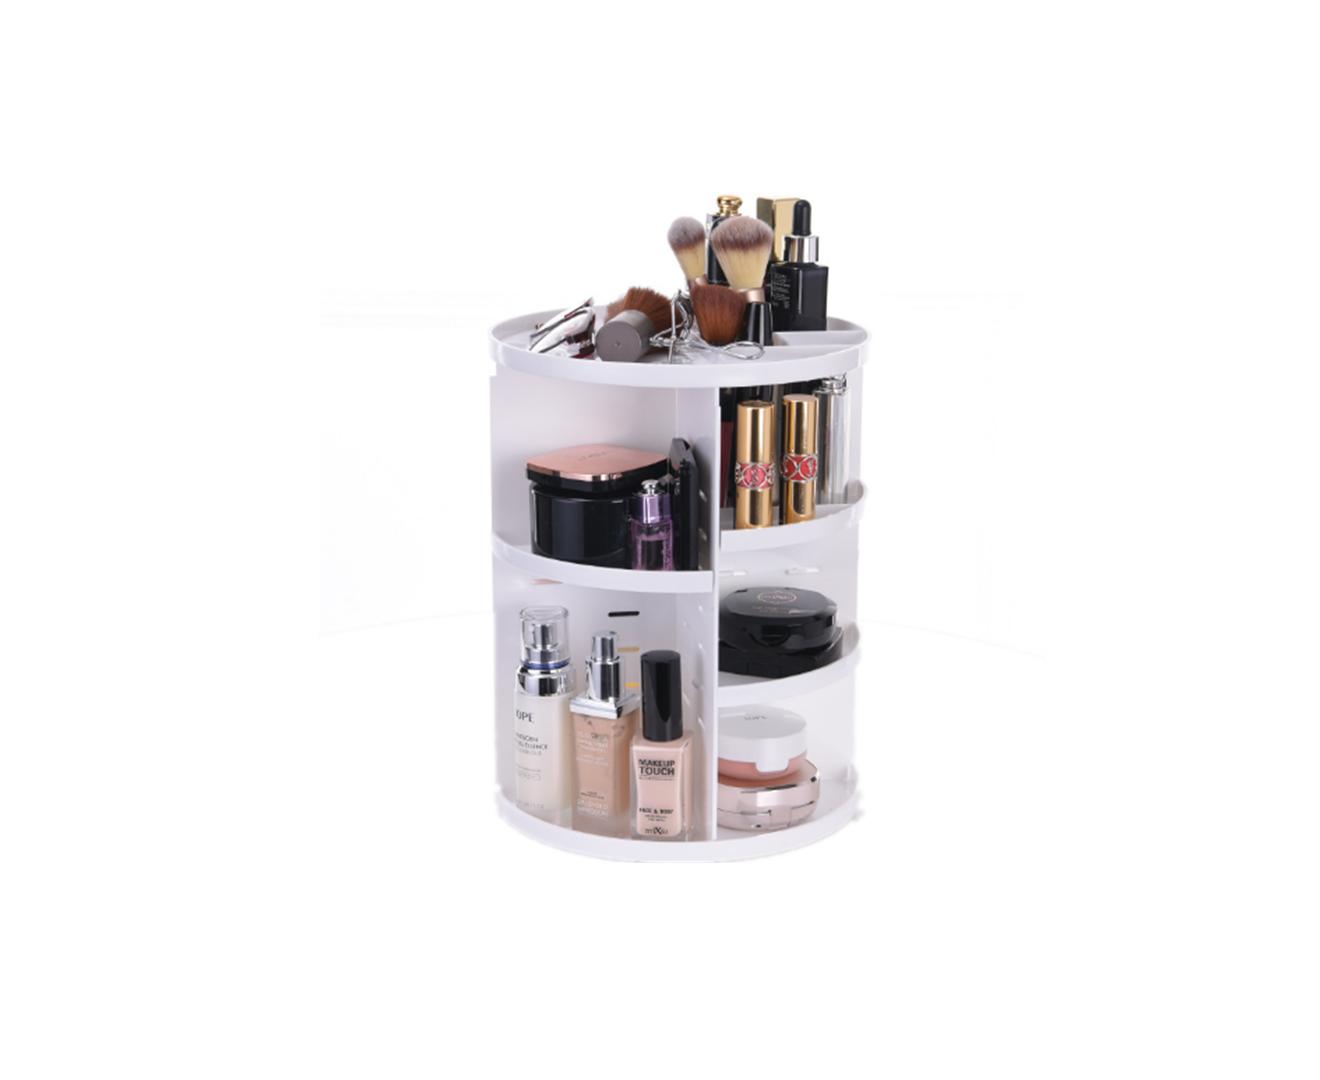 360-degree Rotating Makeup Rack Plastic Storage Box Storage Rack - WHITE